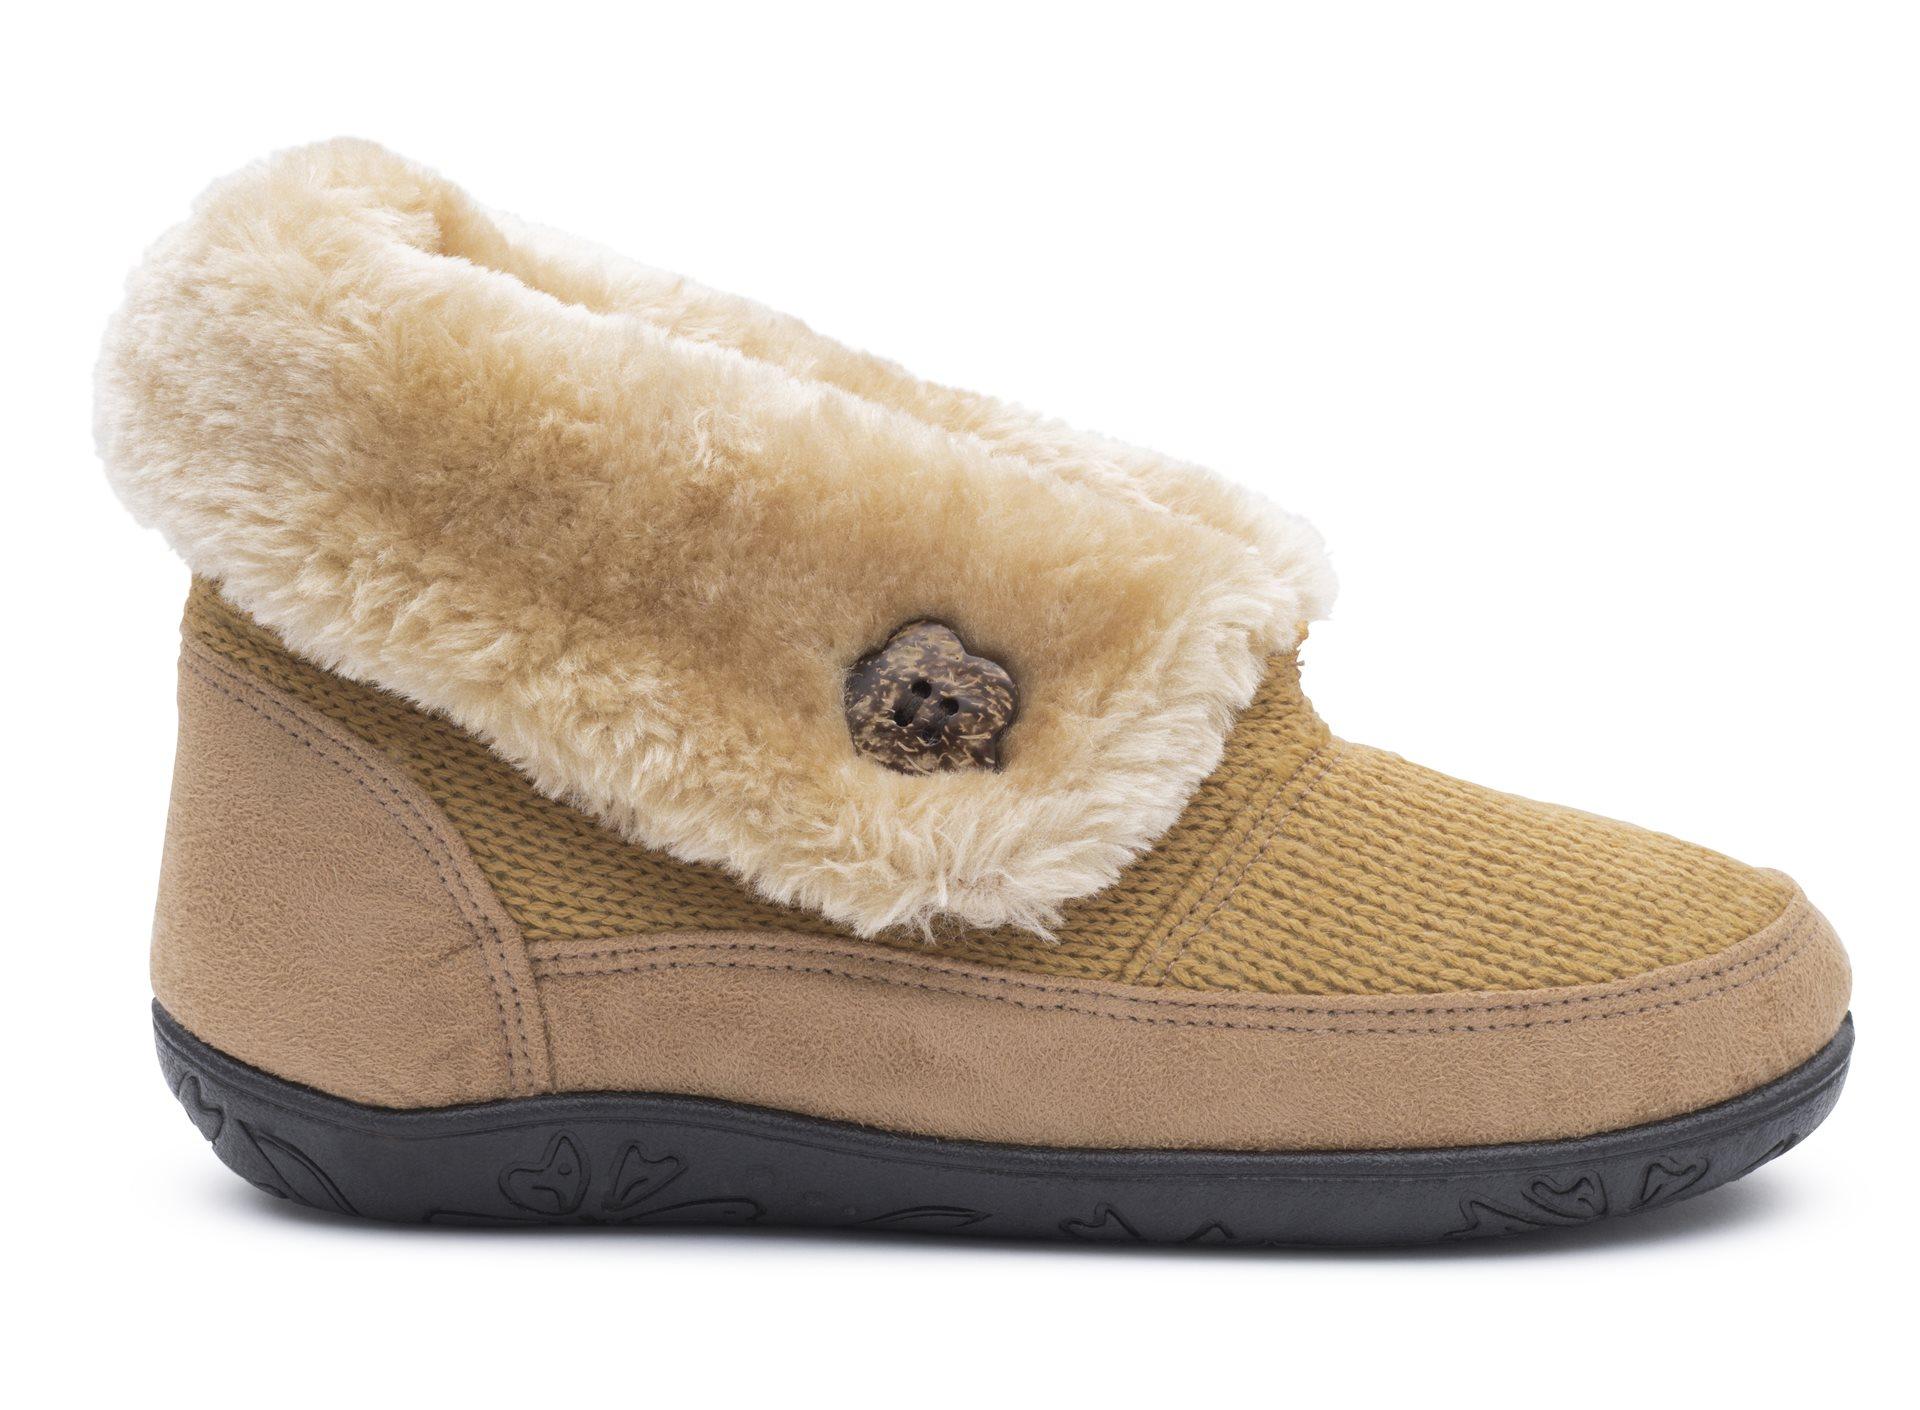 4c604883fa Eden Women's Slippers   Slipper Gift Box   Padders Footwear